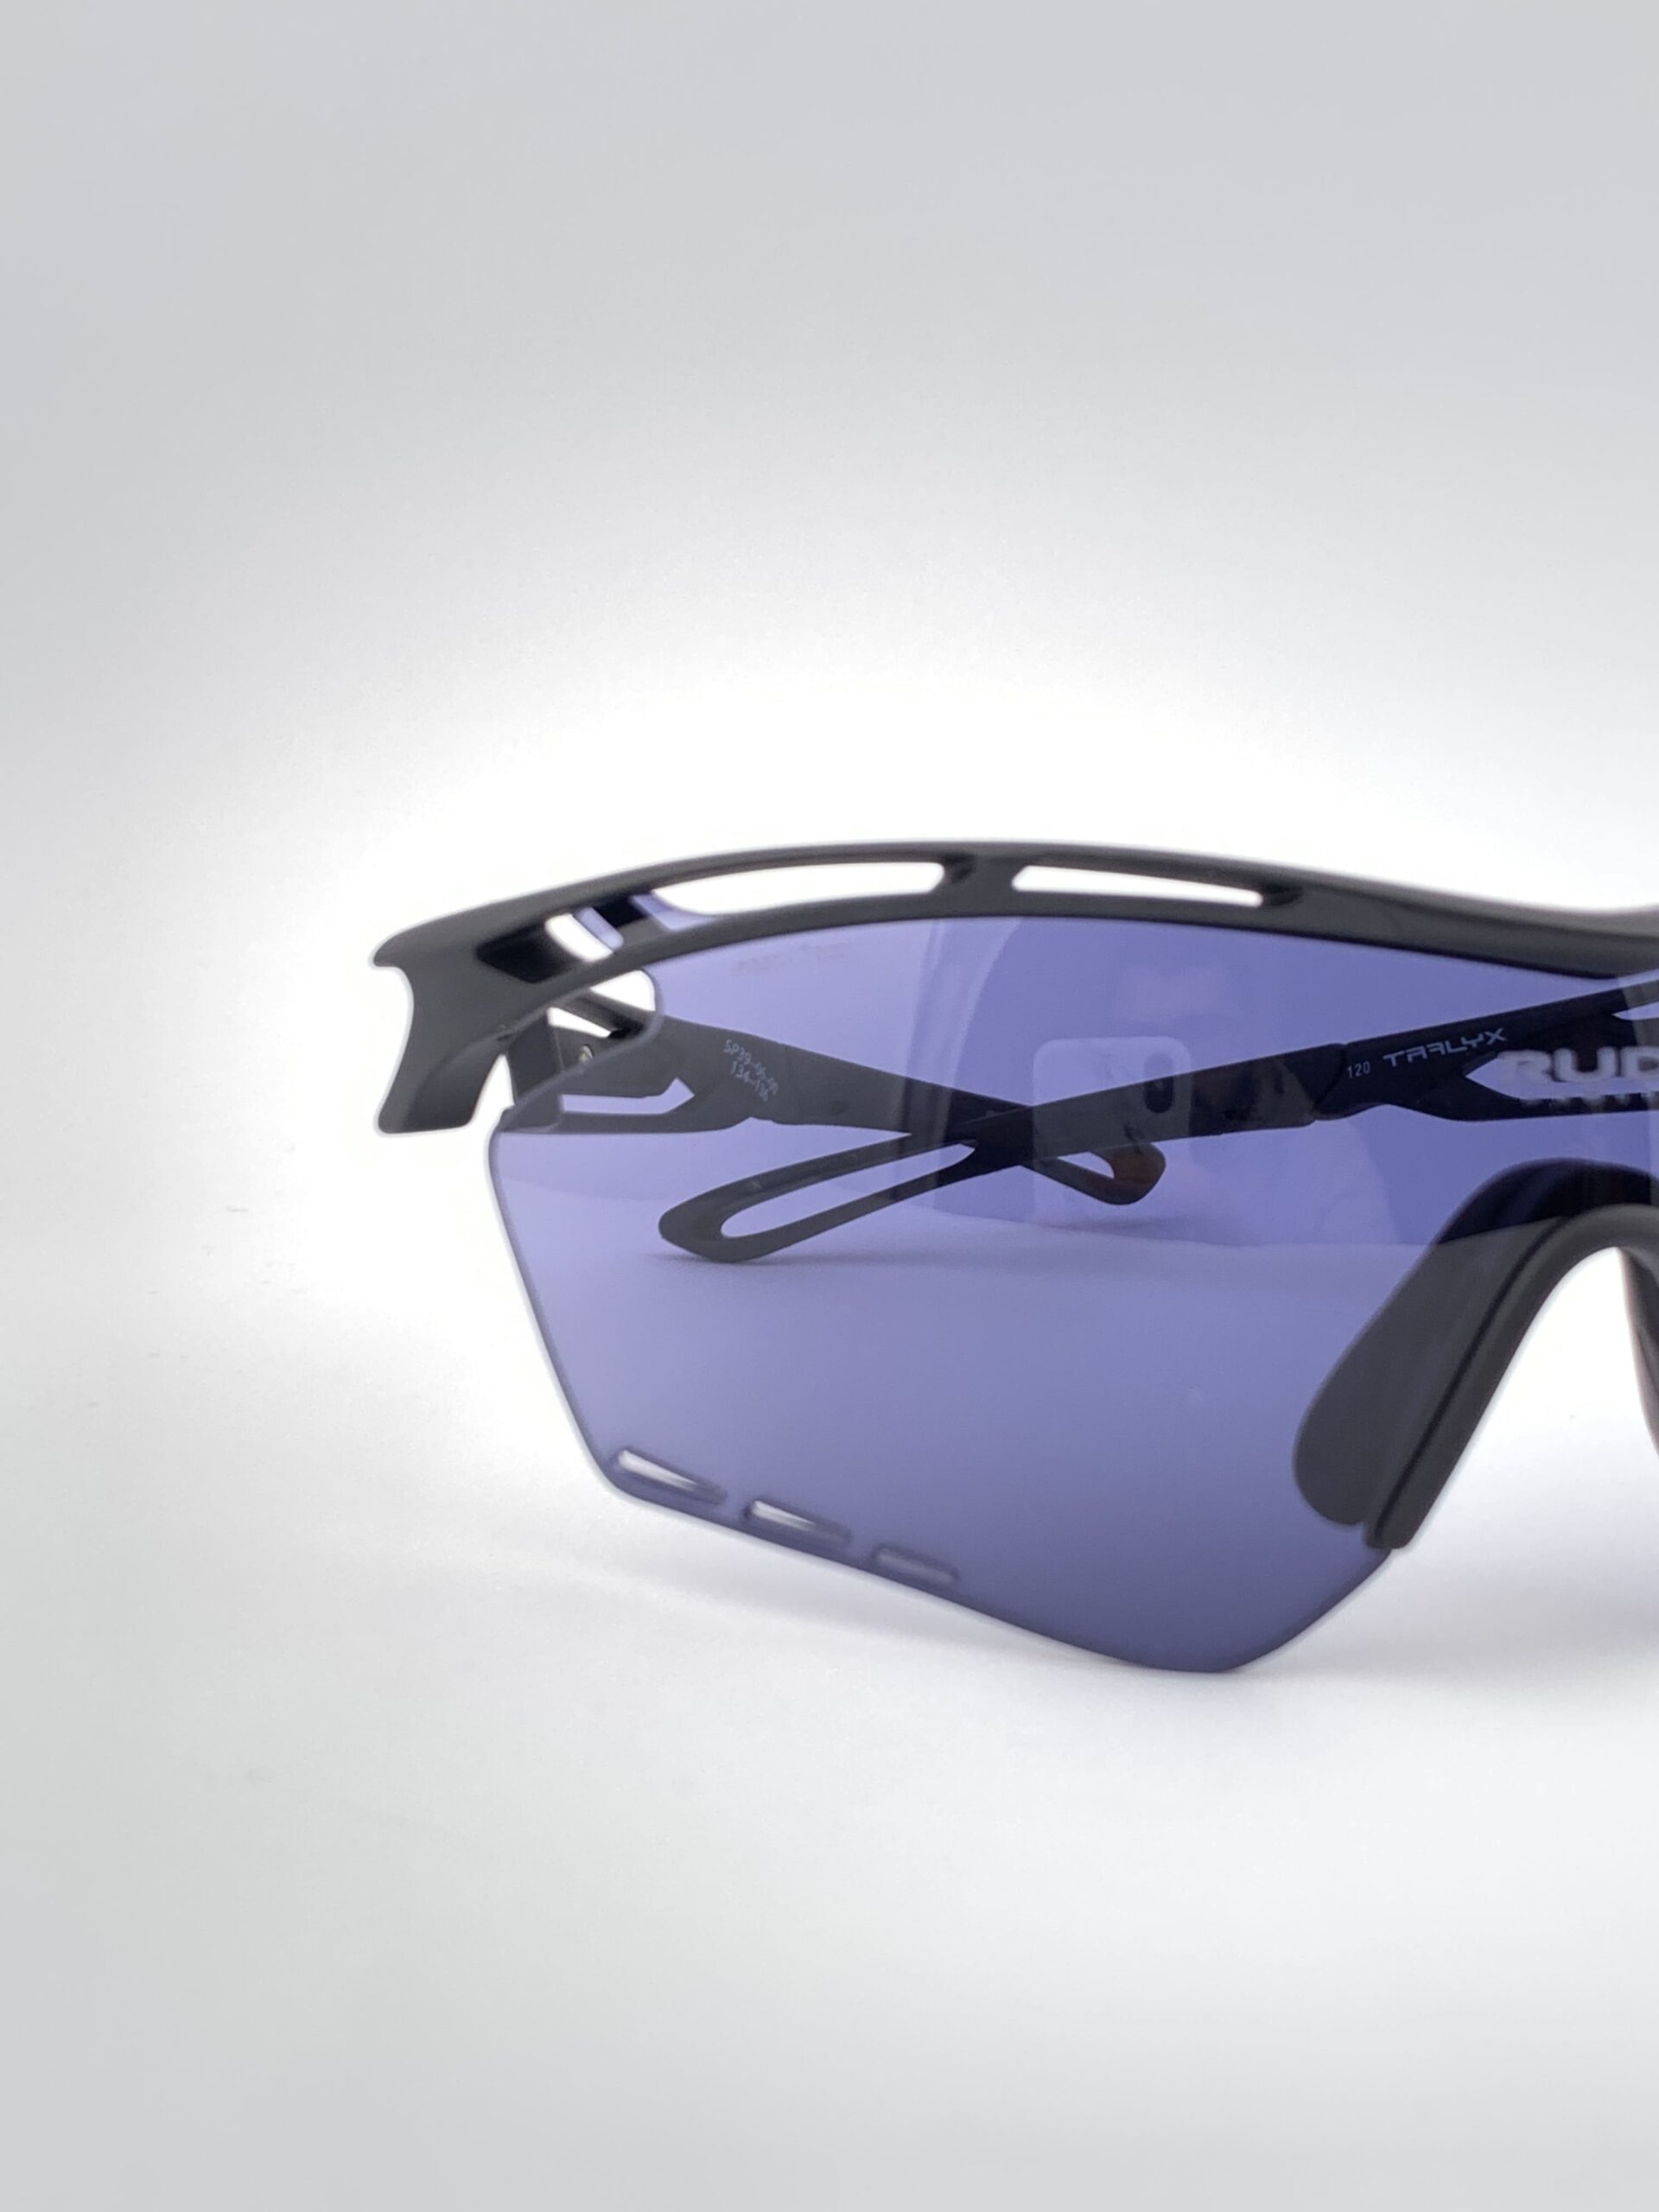 Cyklistické okuliare Tralyx čierne detail zatmavené